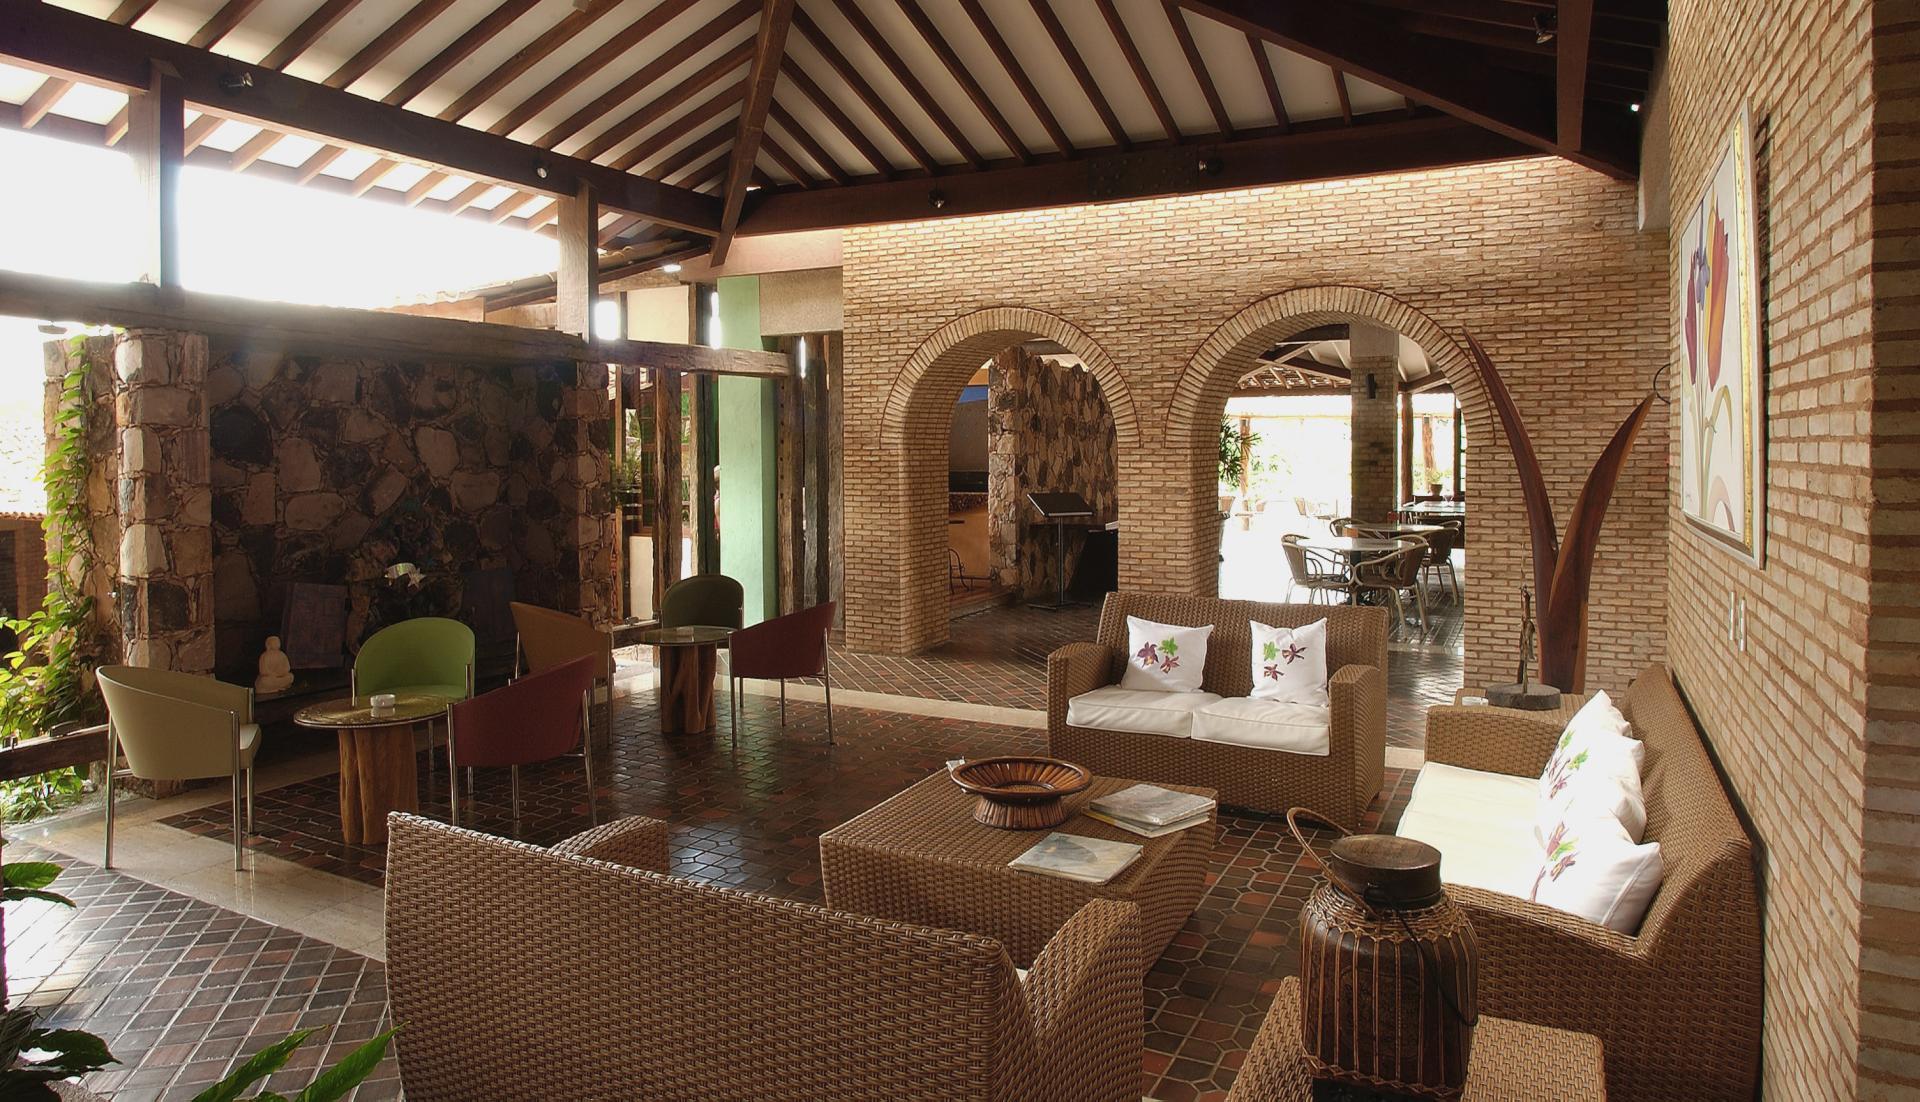 Lobby with Sofas at Hotel Canto das Aguas - Chapada Diamantina, Bahia